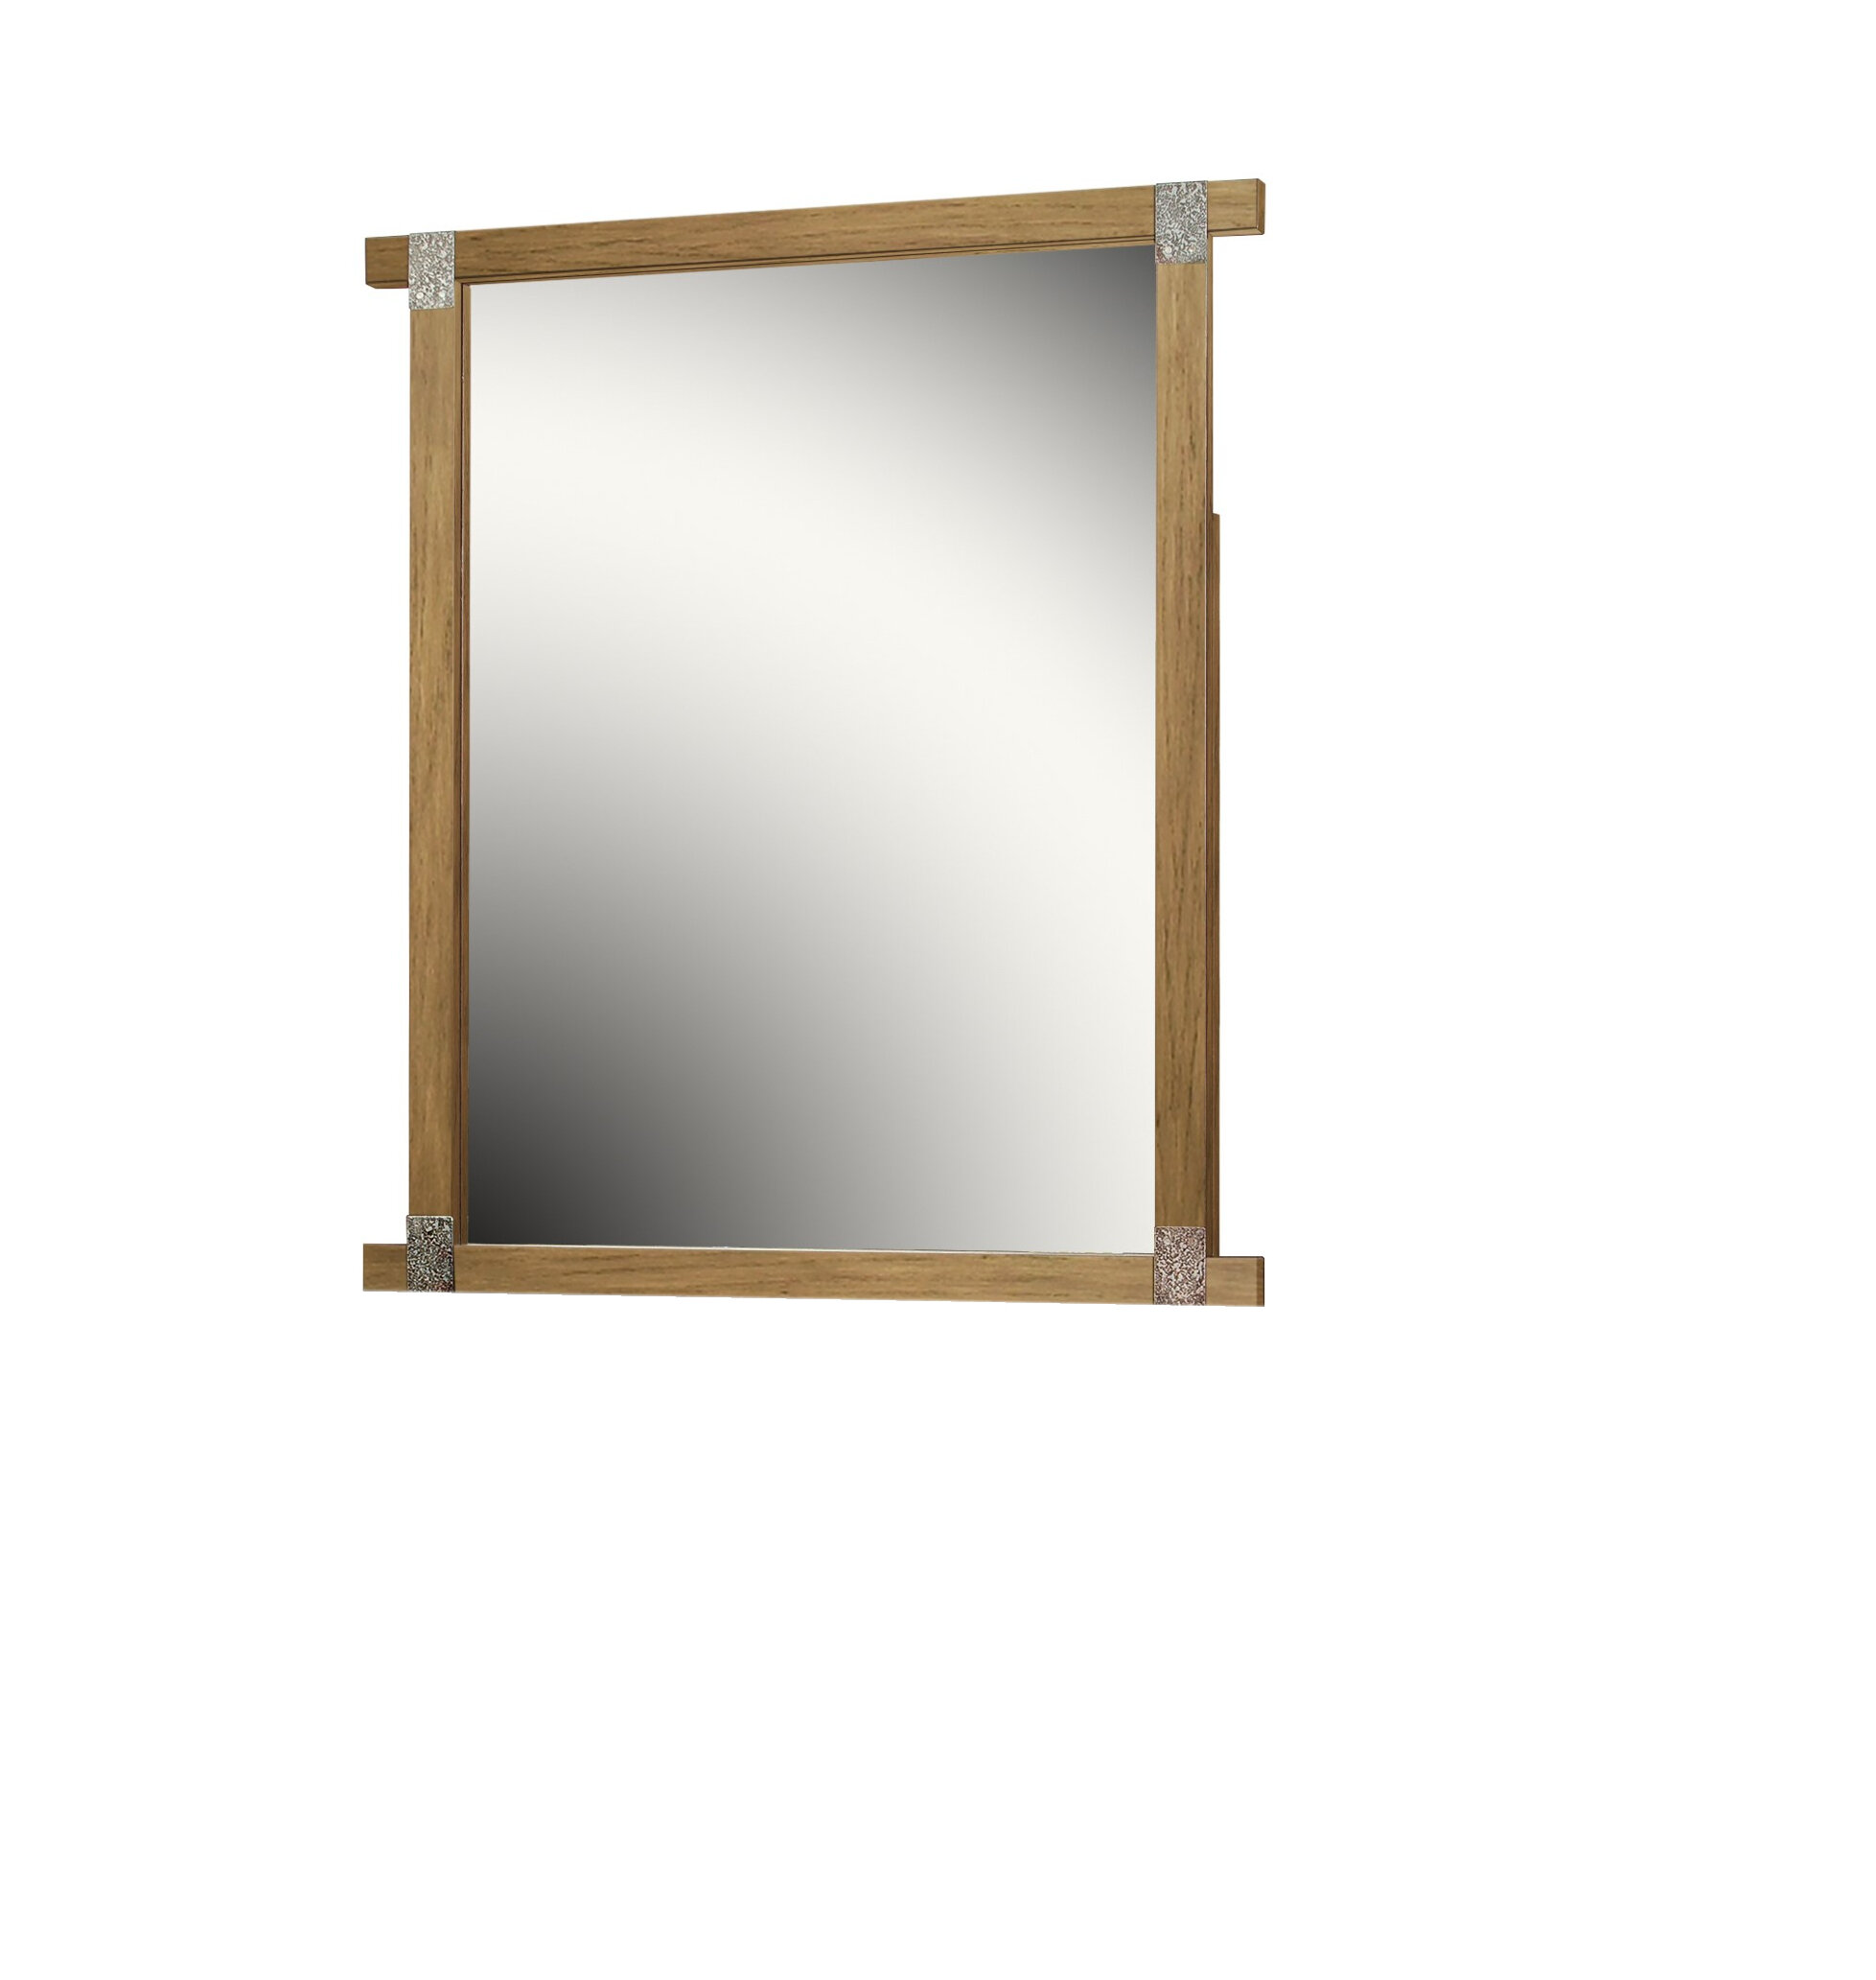 Millwood Pines Sanora Accent Mirror Wayfair